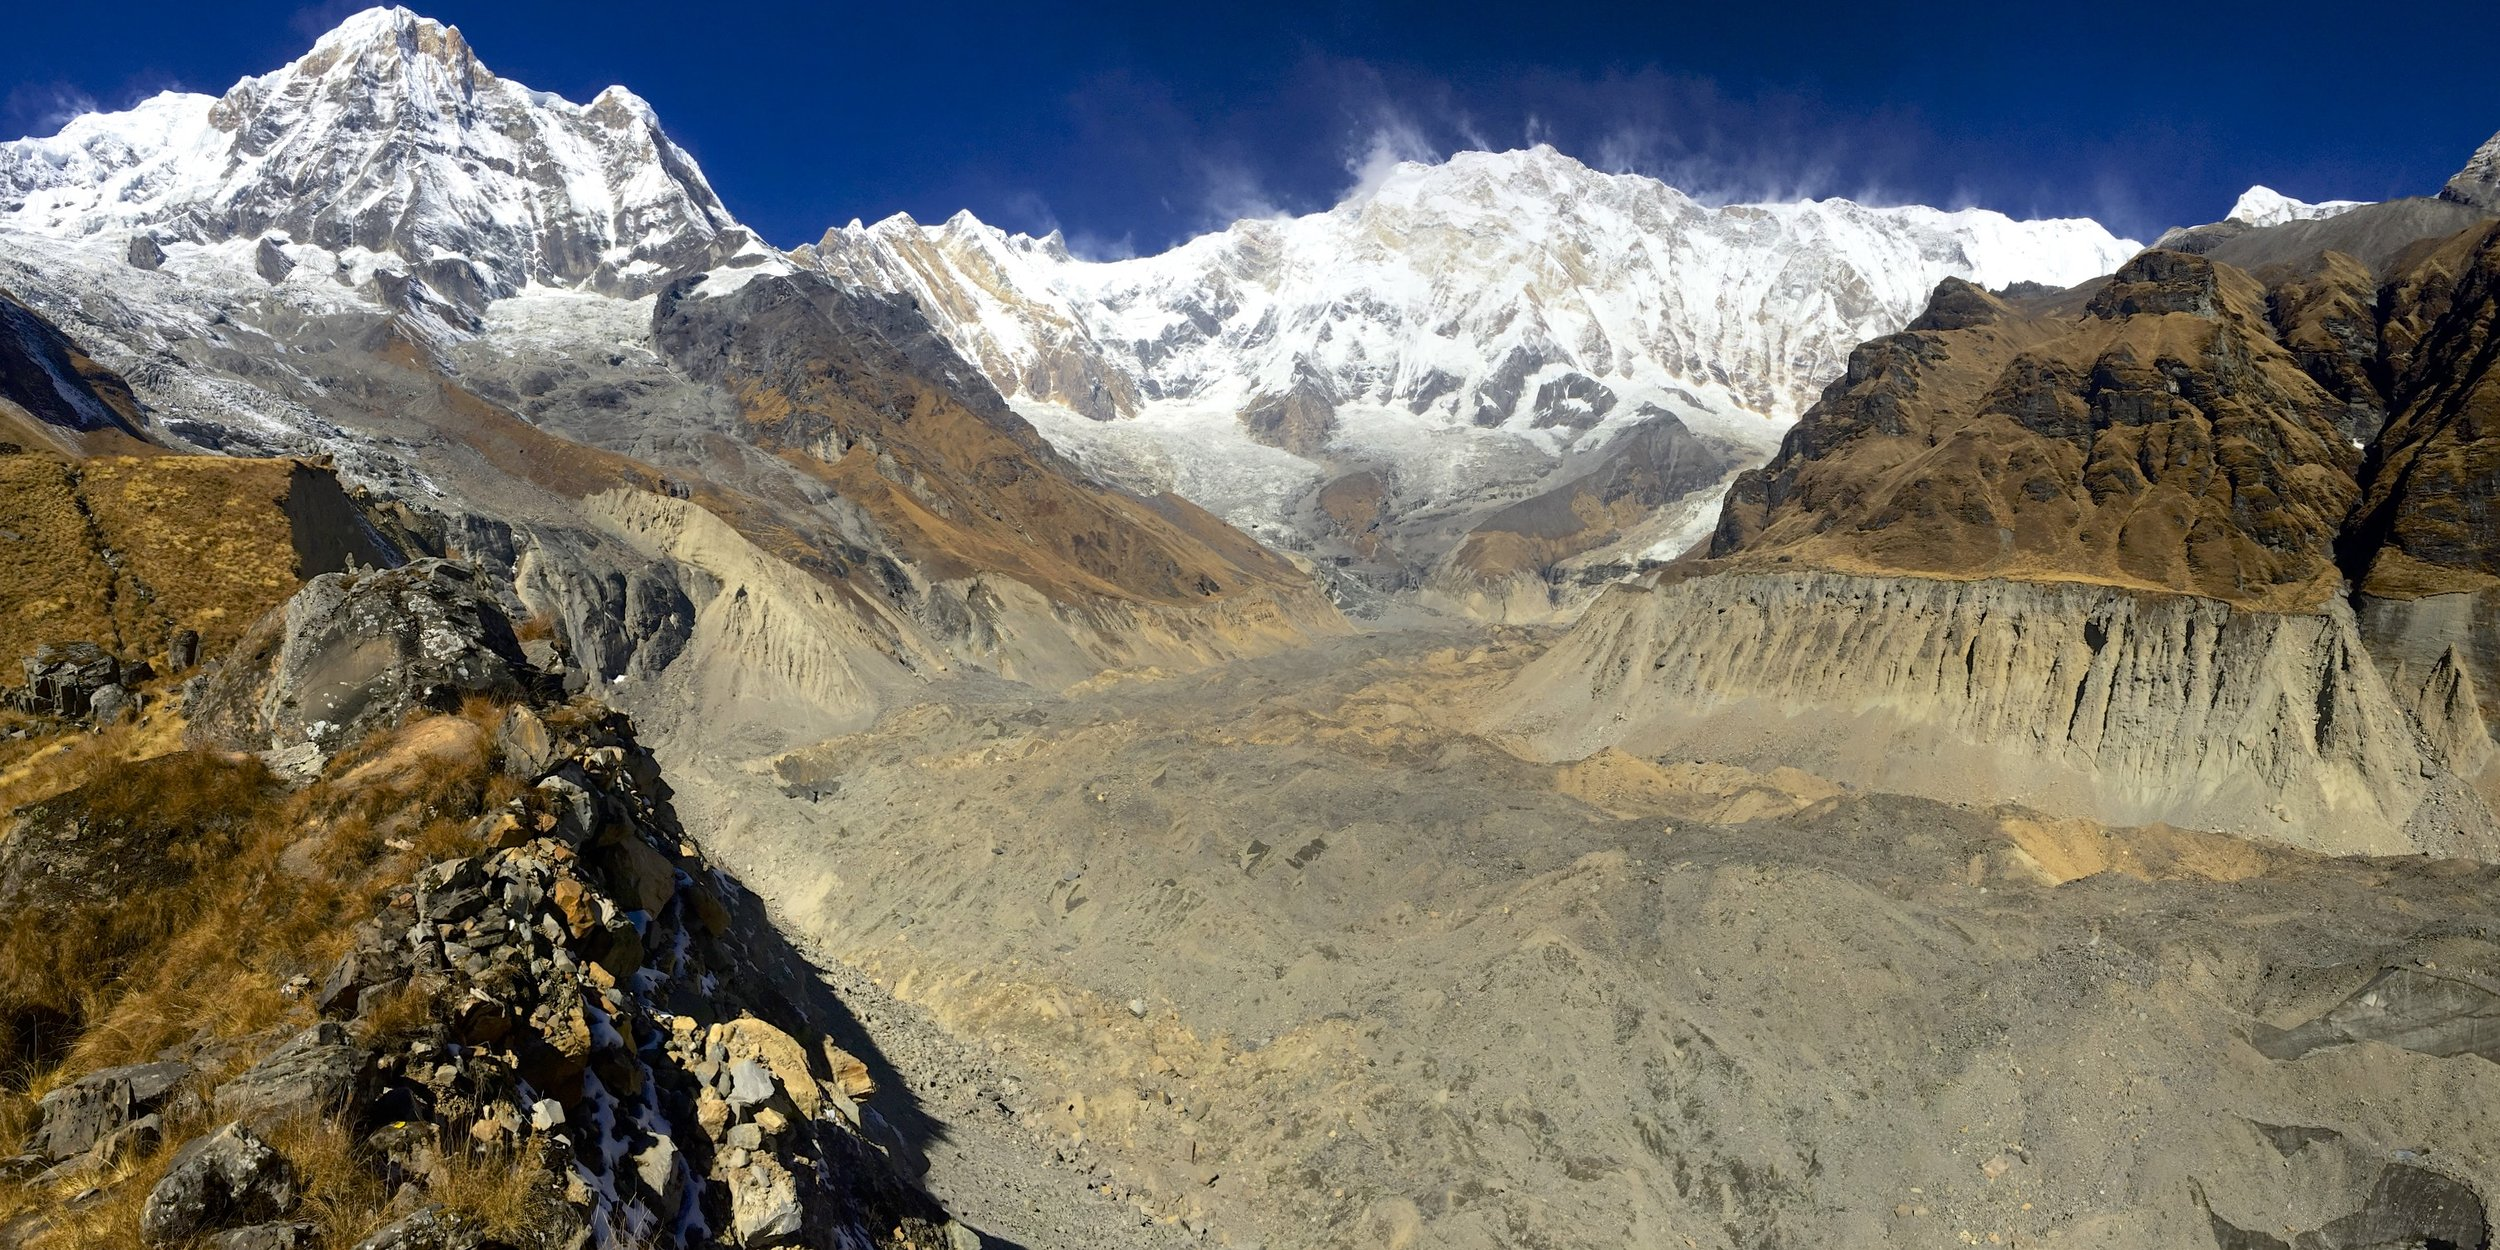 Annapurna I and the Annapurna Glacier